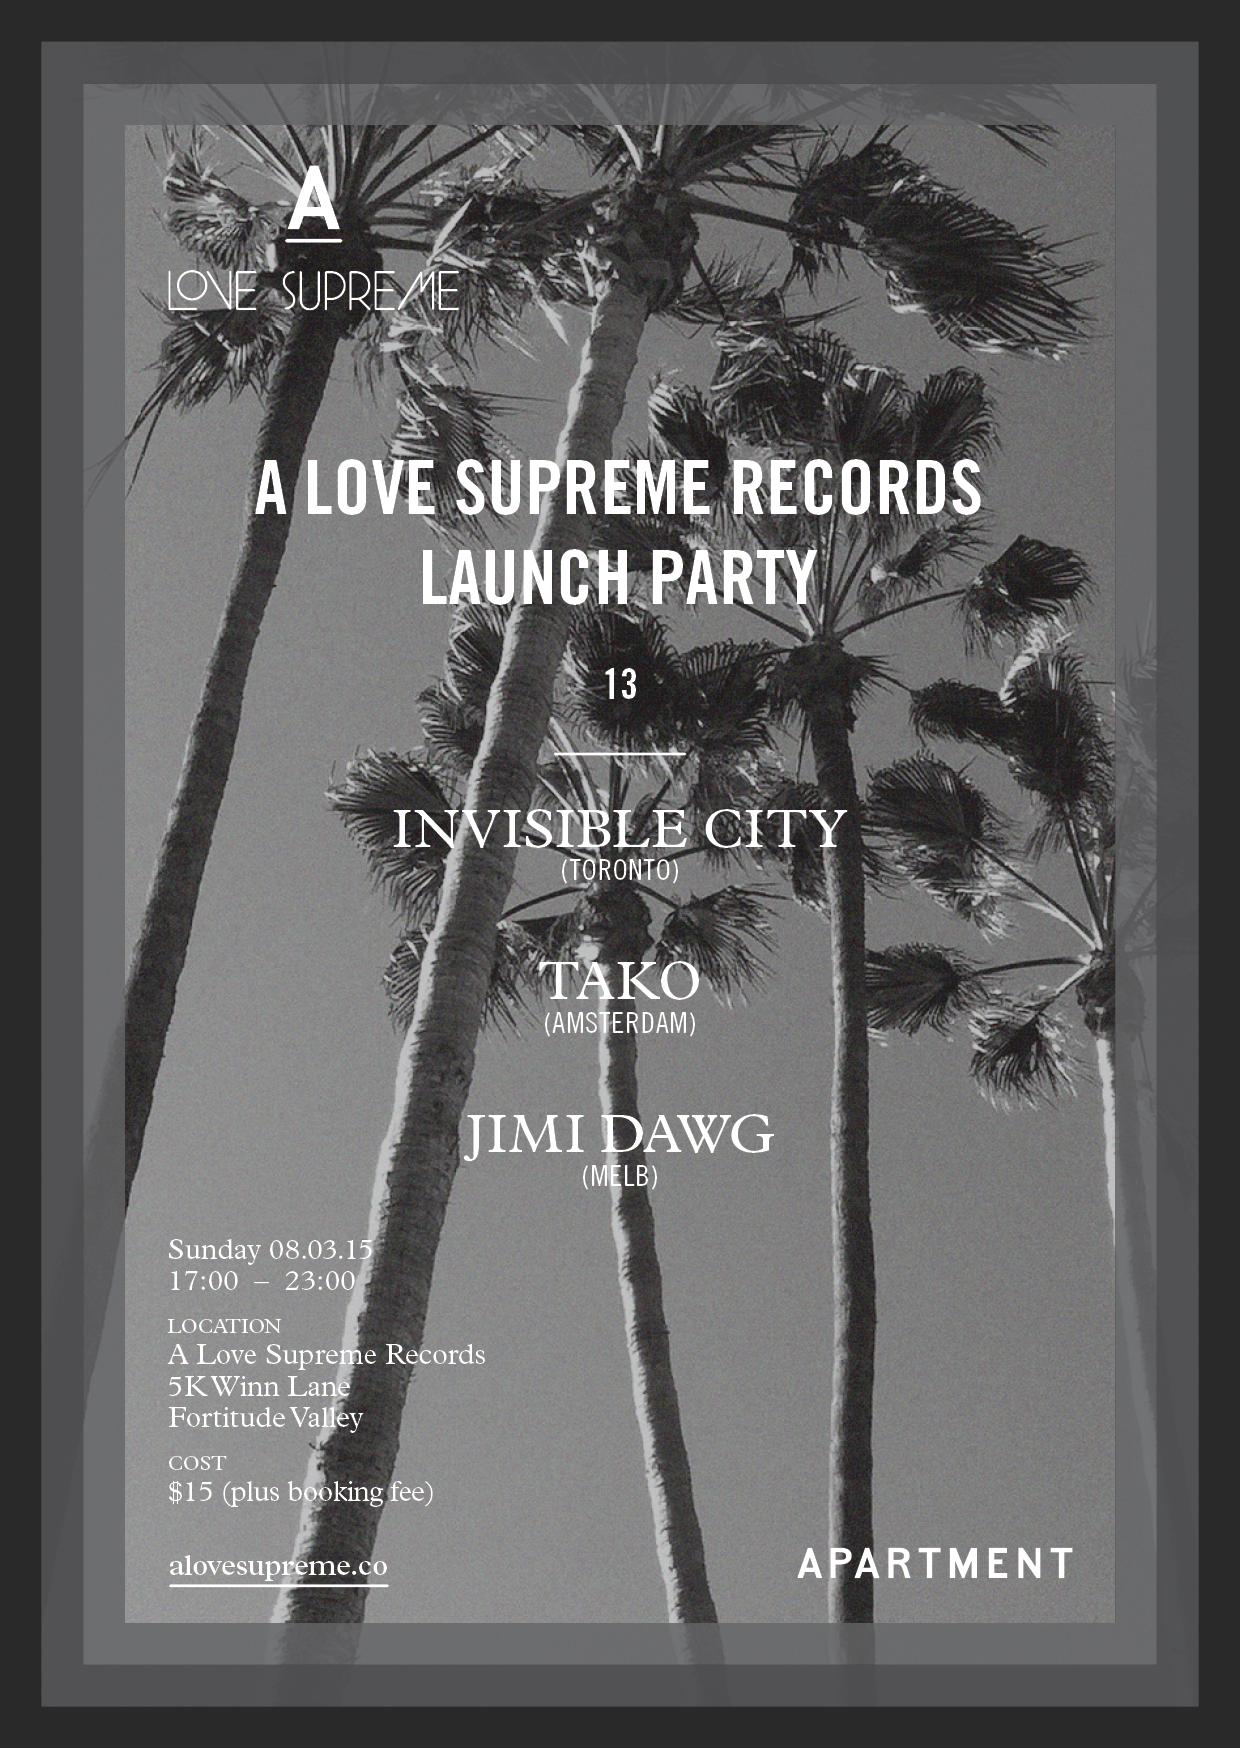 ALS-alovesupreme-13-invisible-city-postcard-press-.png